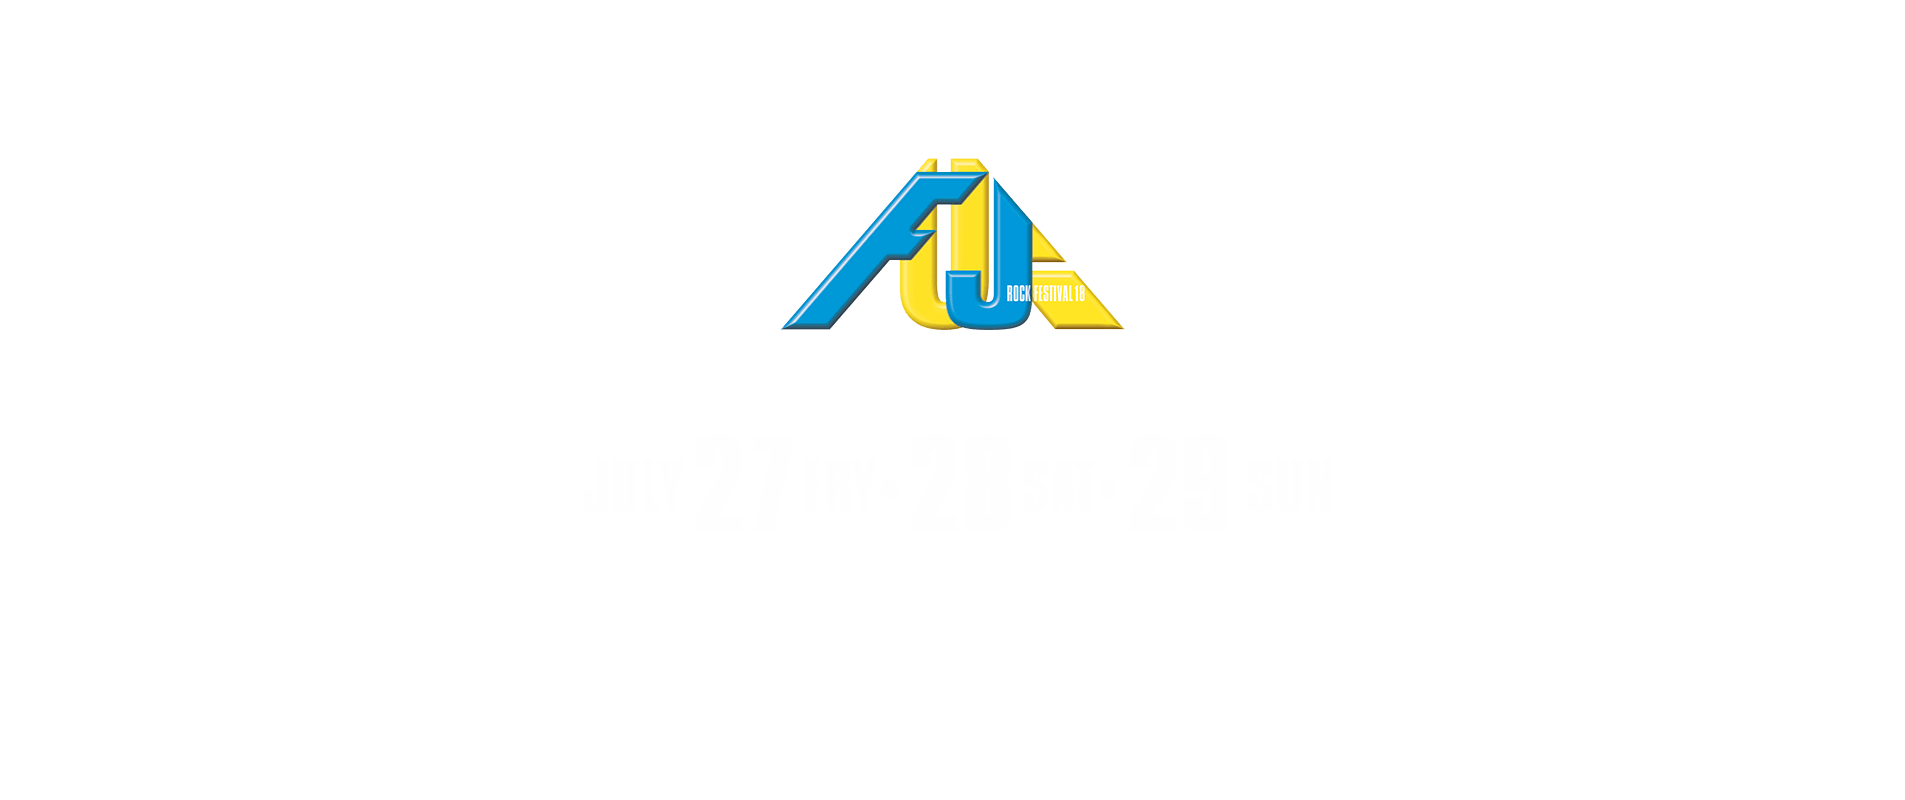 Fuji, Rock, Festival, FujiRock, frf, Japan, Tour, 2018